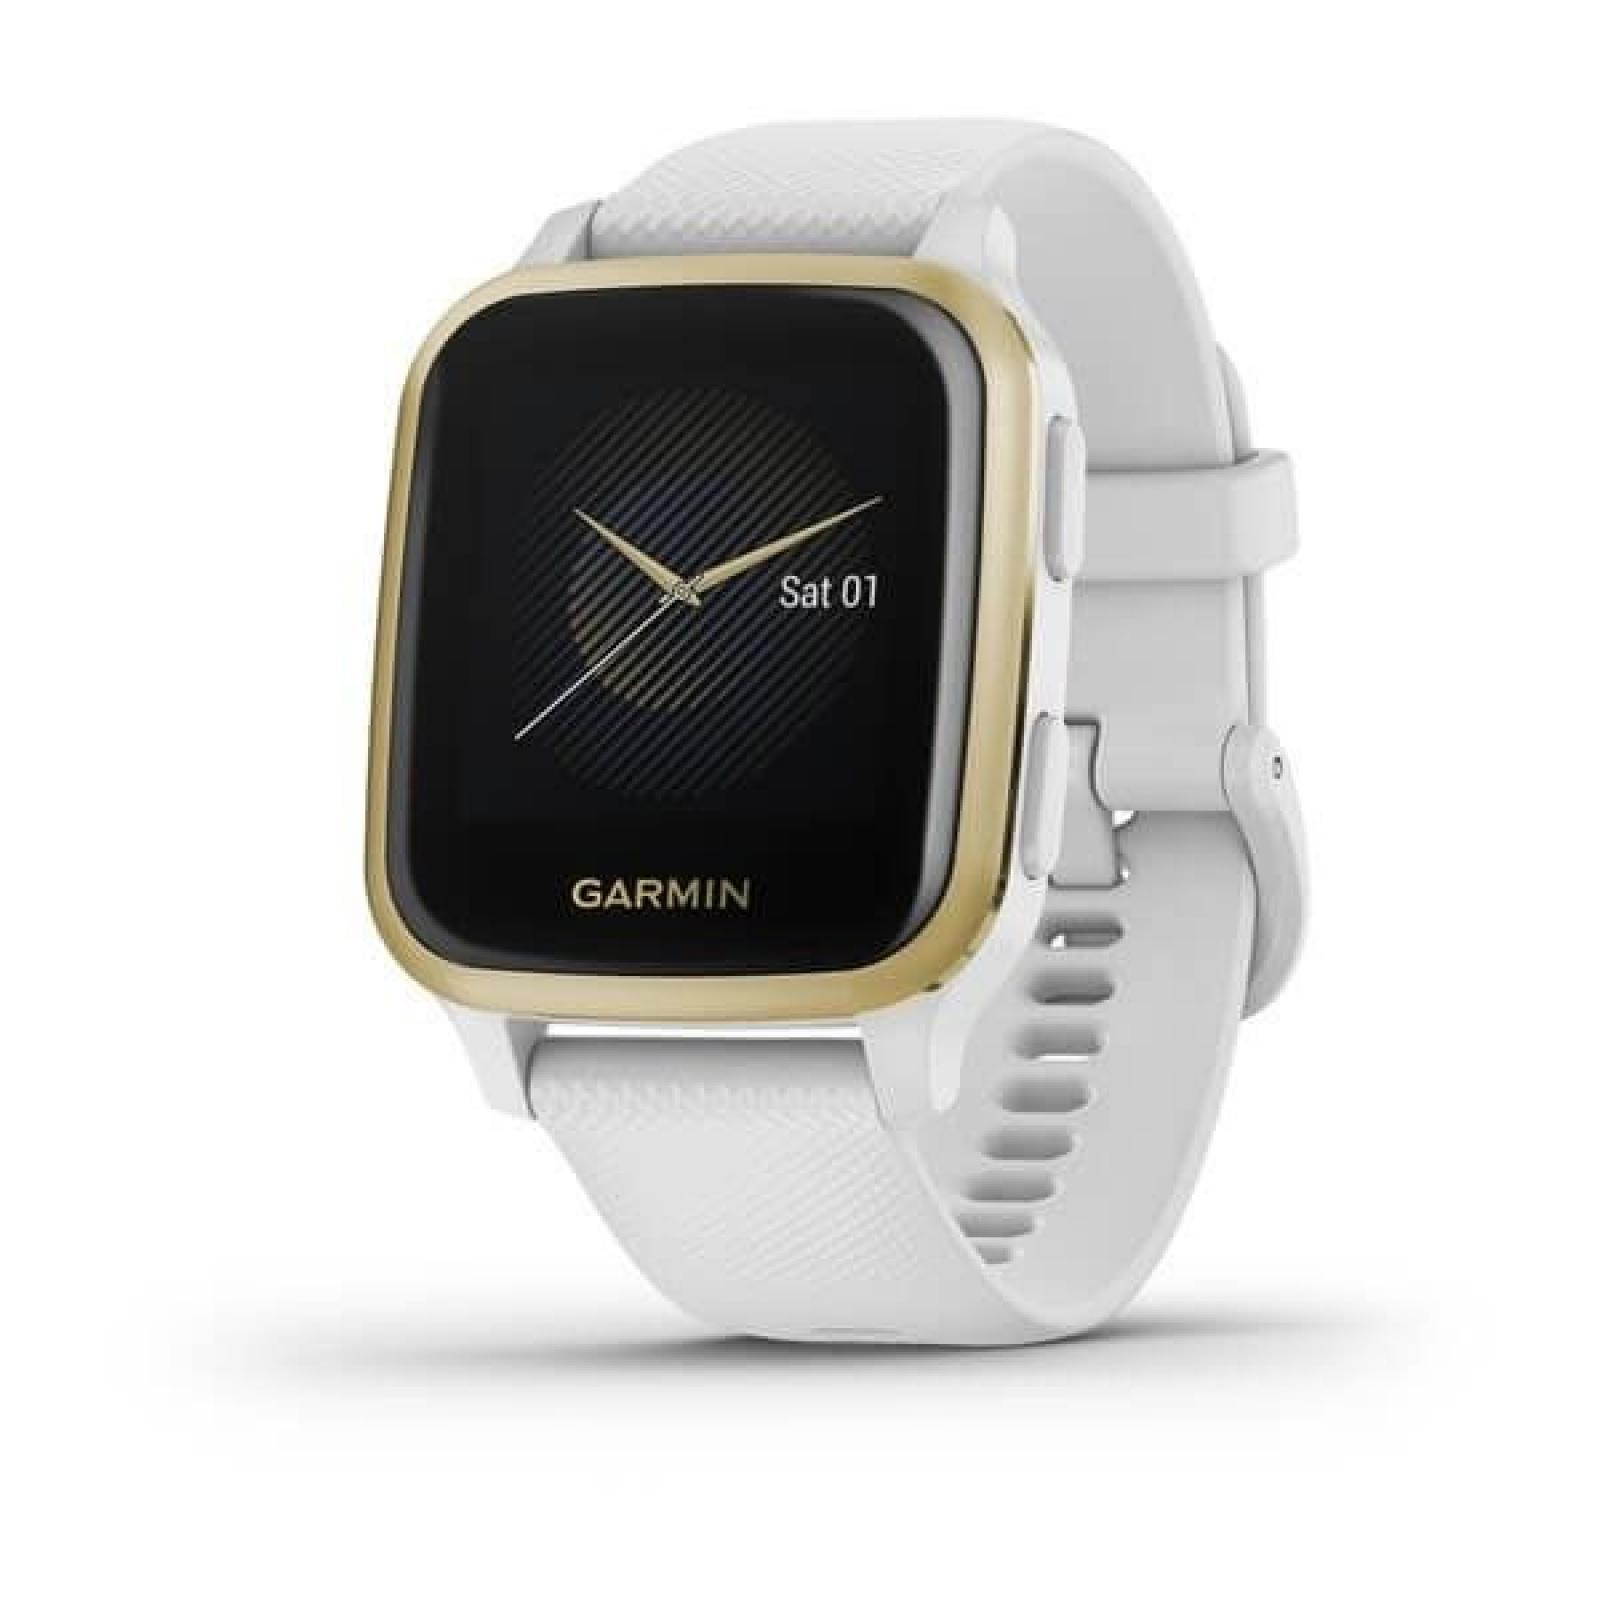 https://www.badec.store/produkty_img/garmin-venu-sq1606673437L.jpg